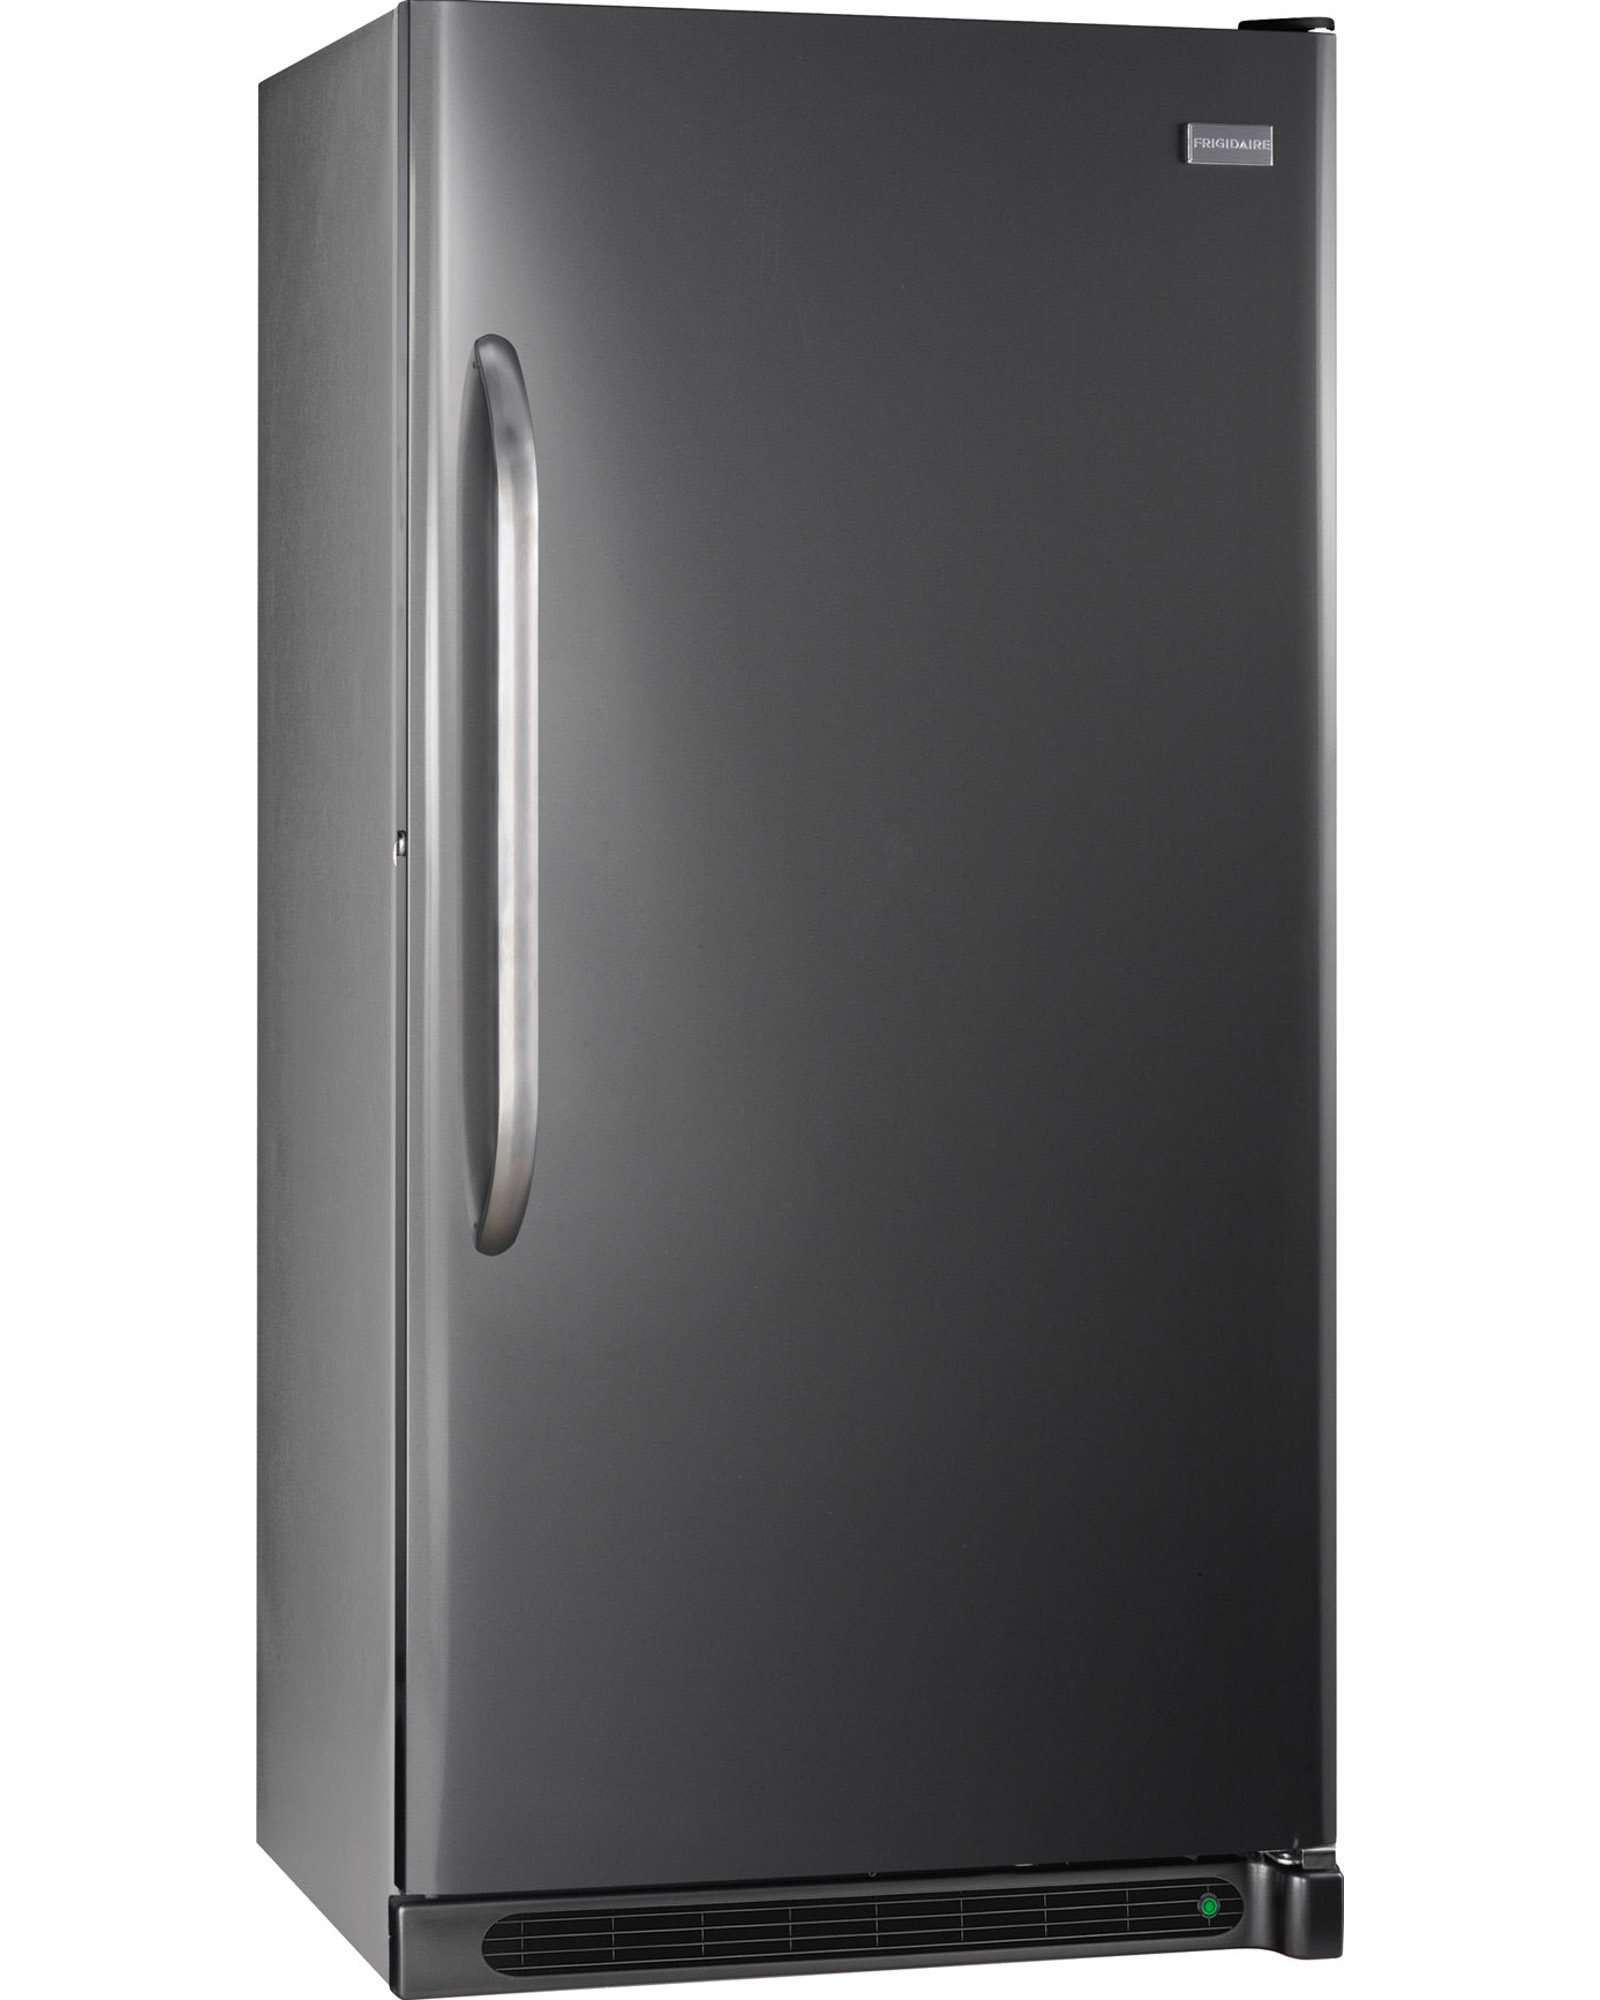 Frigidaire FFFH17F4QT 16.6 cu. ft. Upright Freezer - Classic Slate